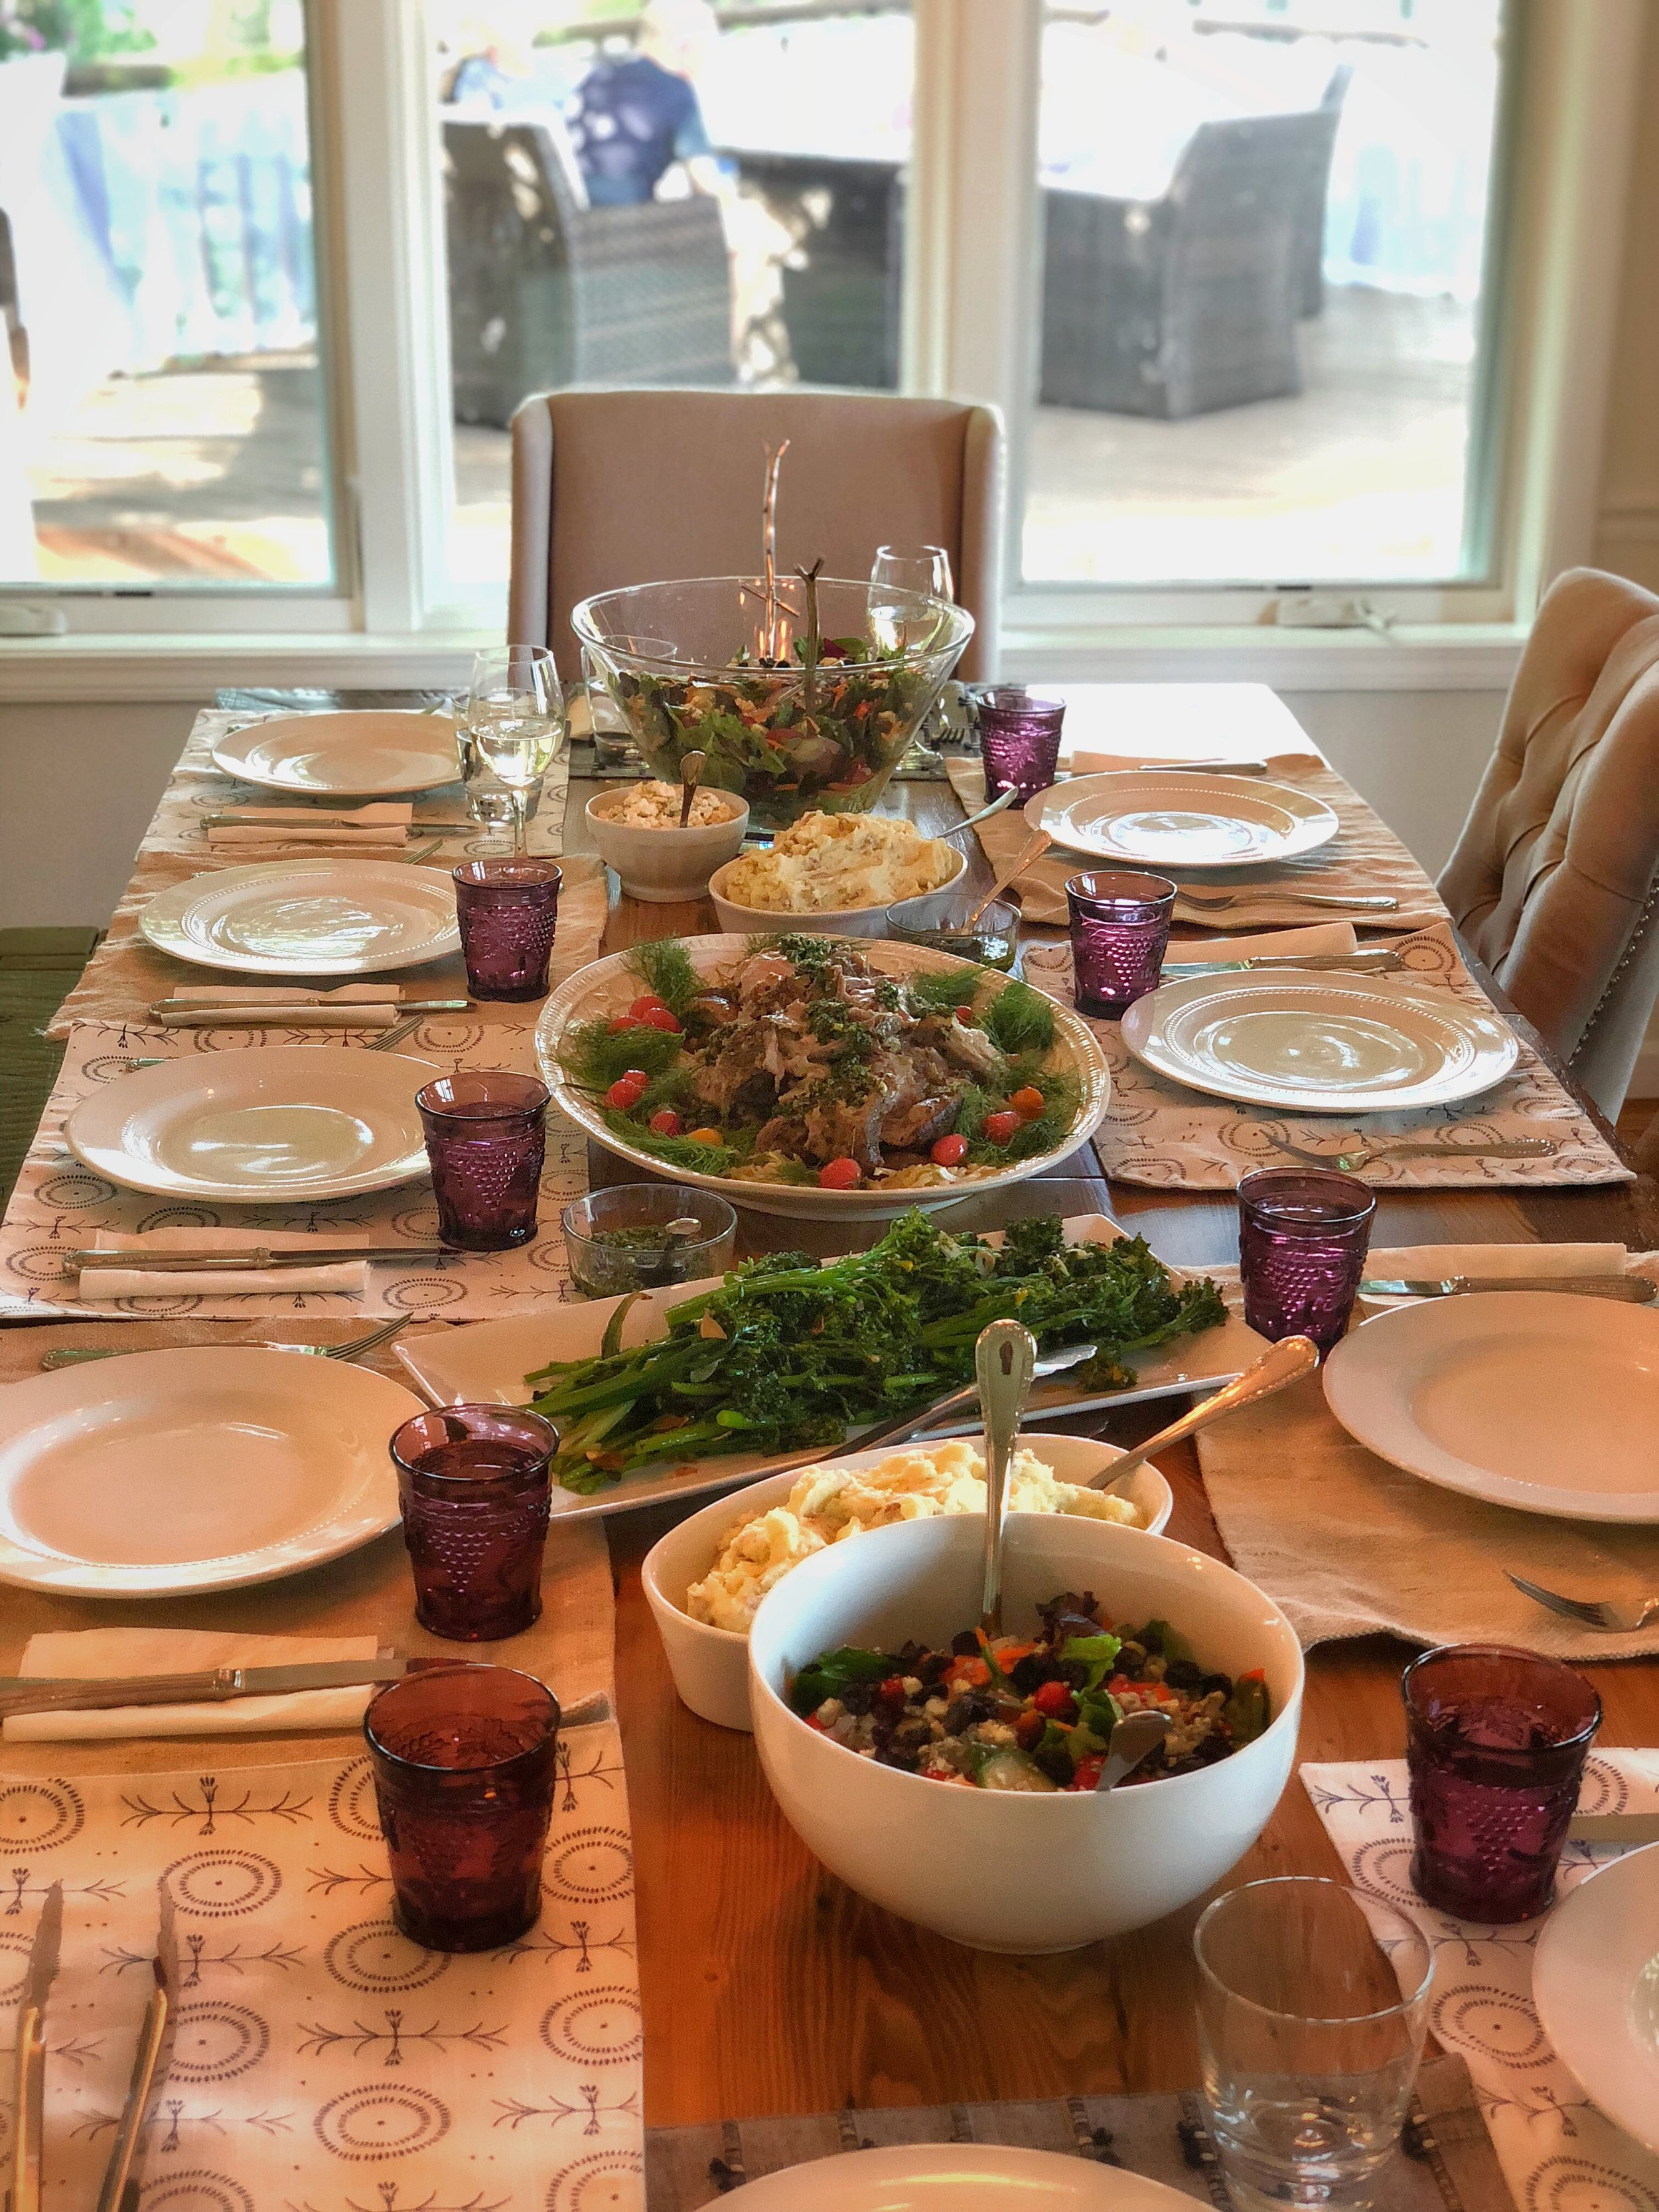 Roast Pork Shoulder, Michigan Cherry Salad, Garlic Broccolini, Smoked Gouda Mashed Potato